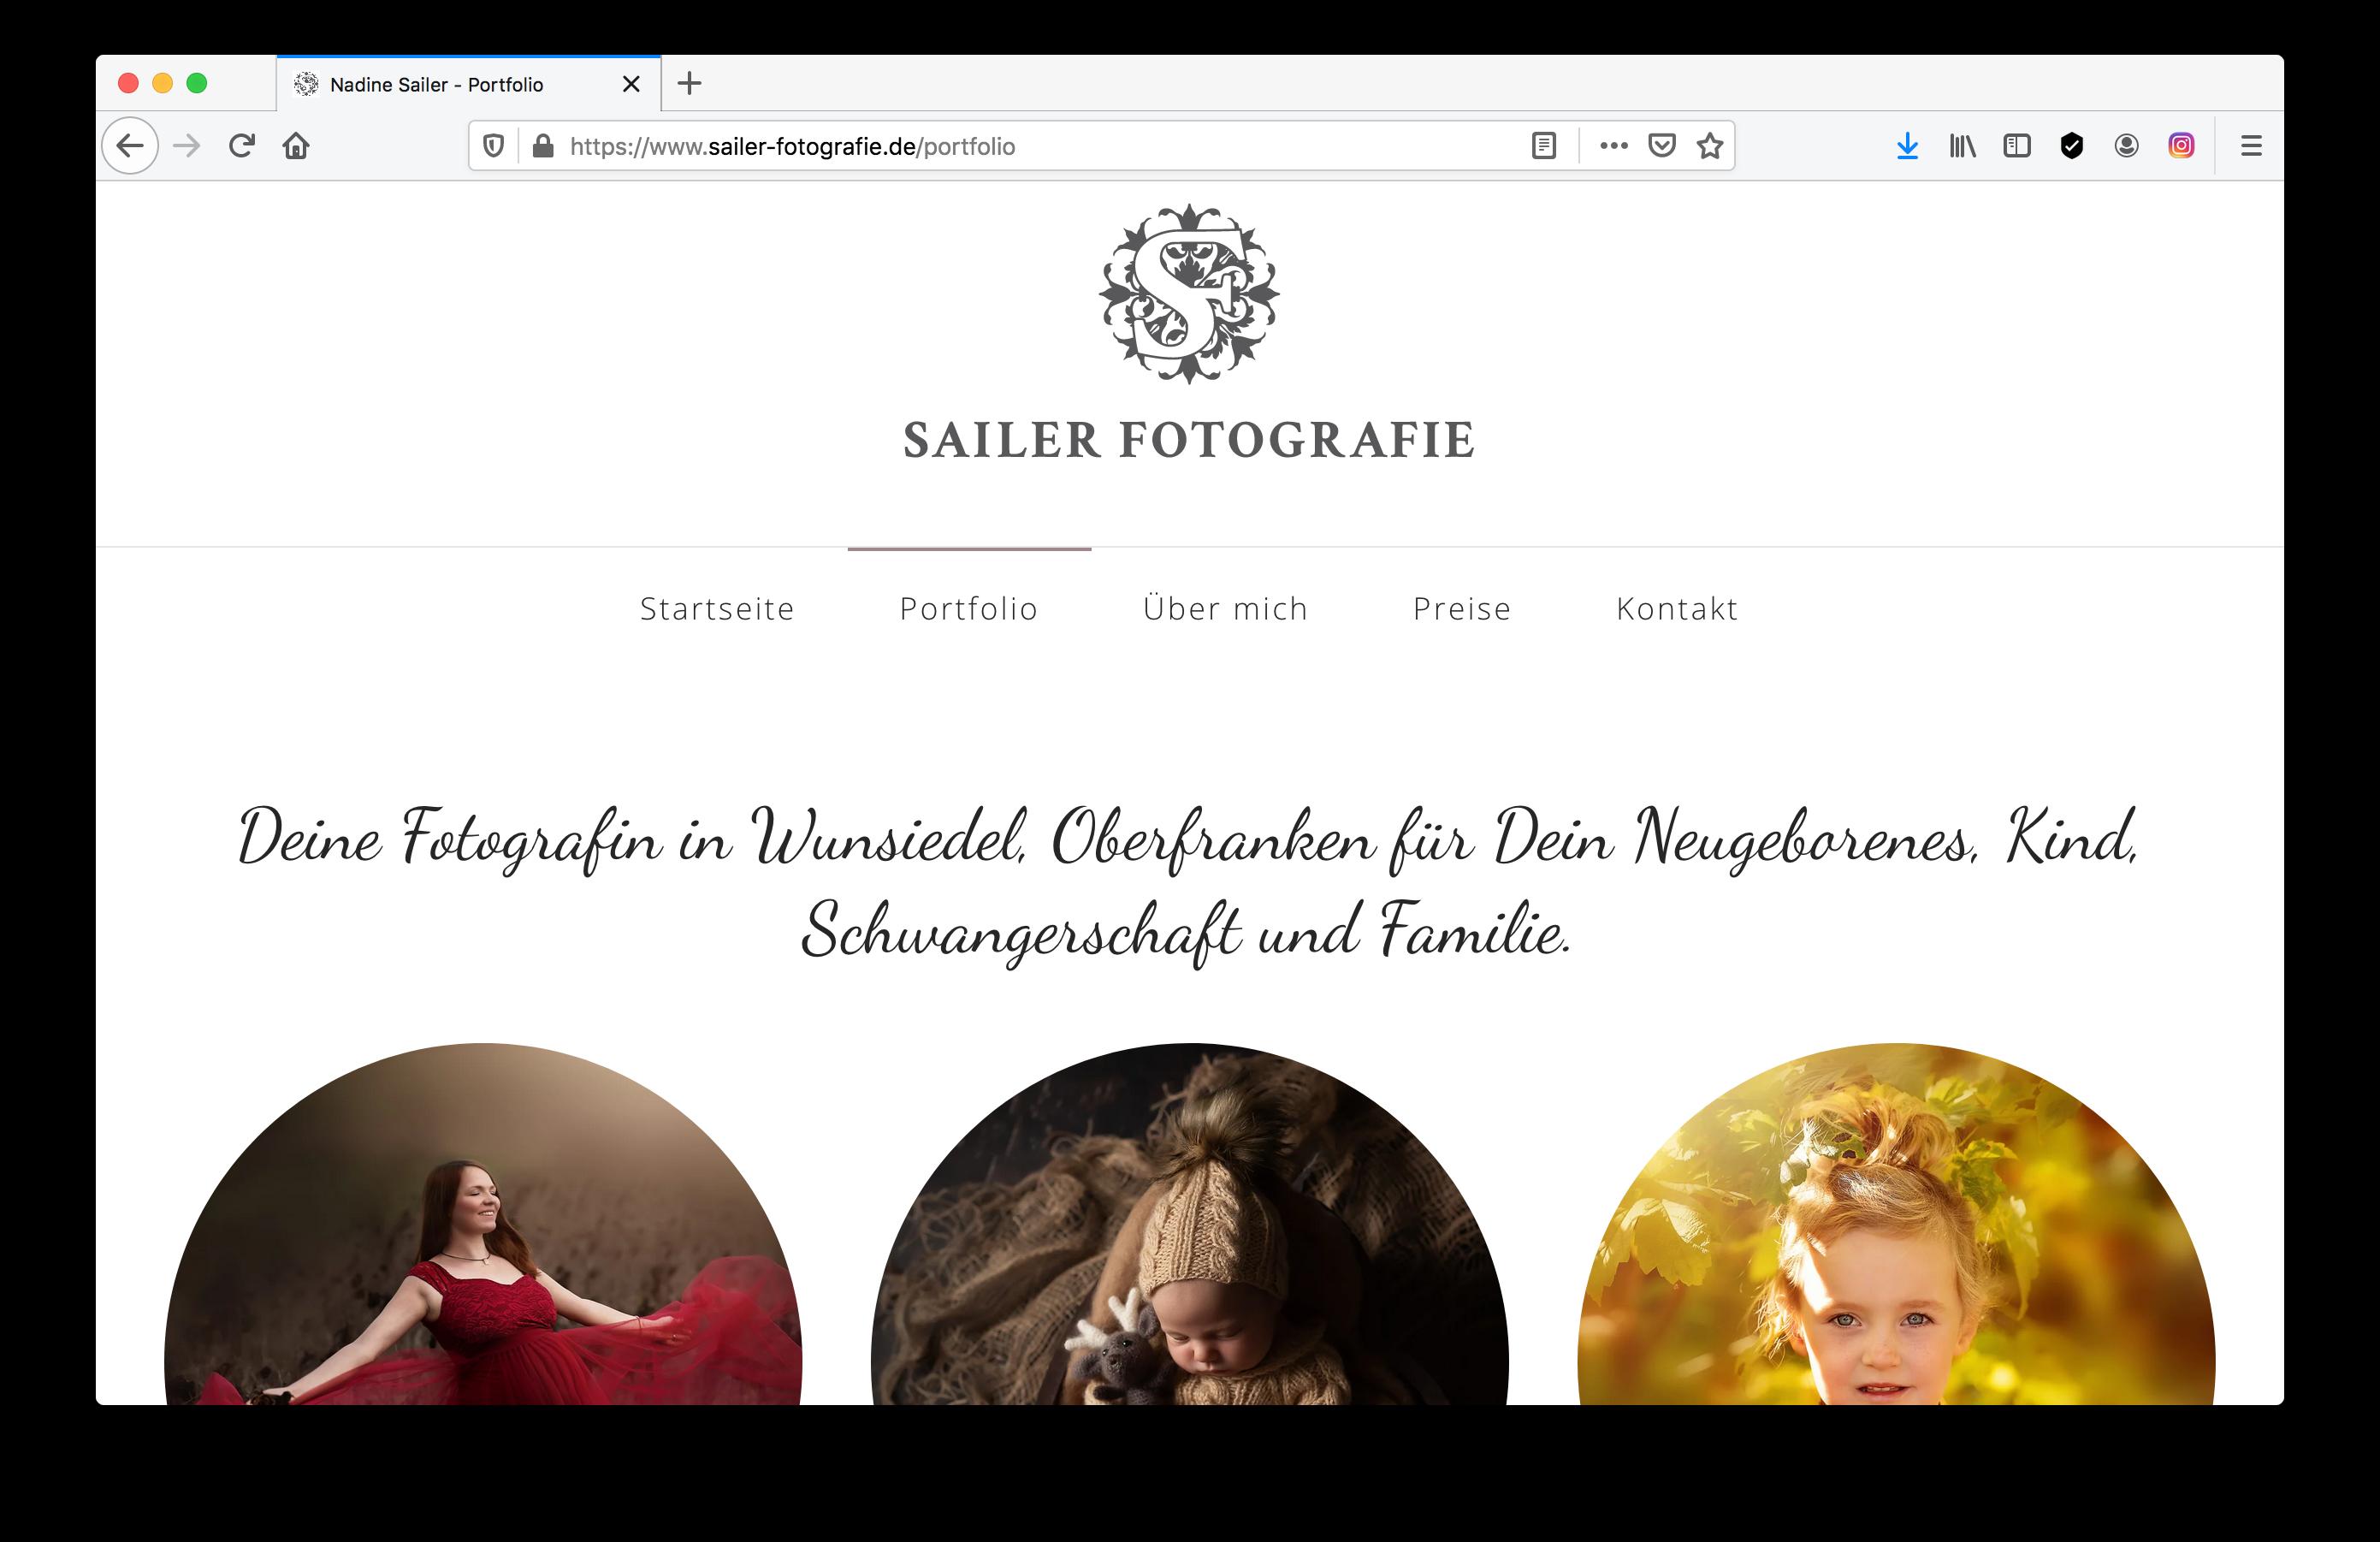 www.sailer-fotografie.de